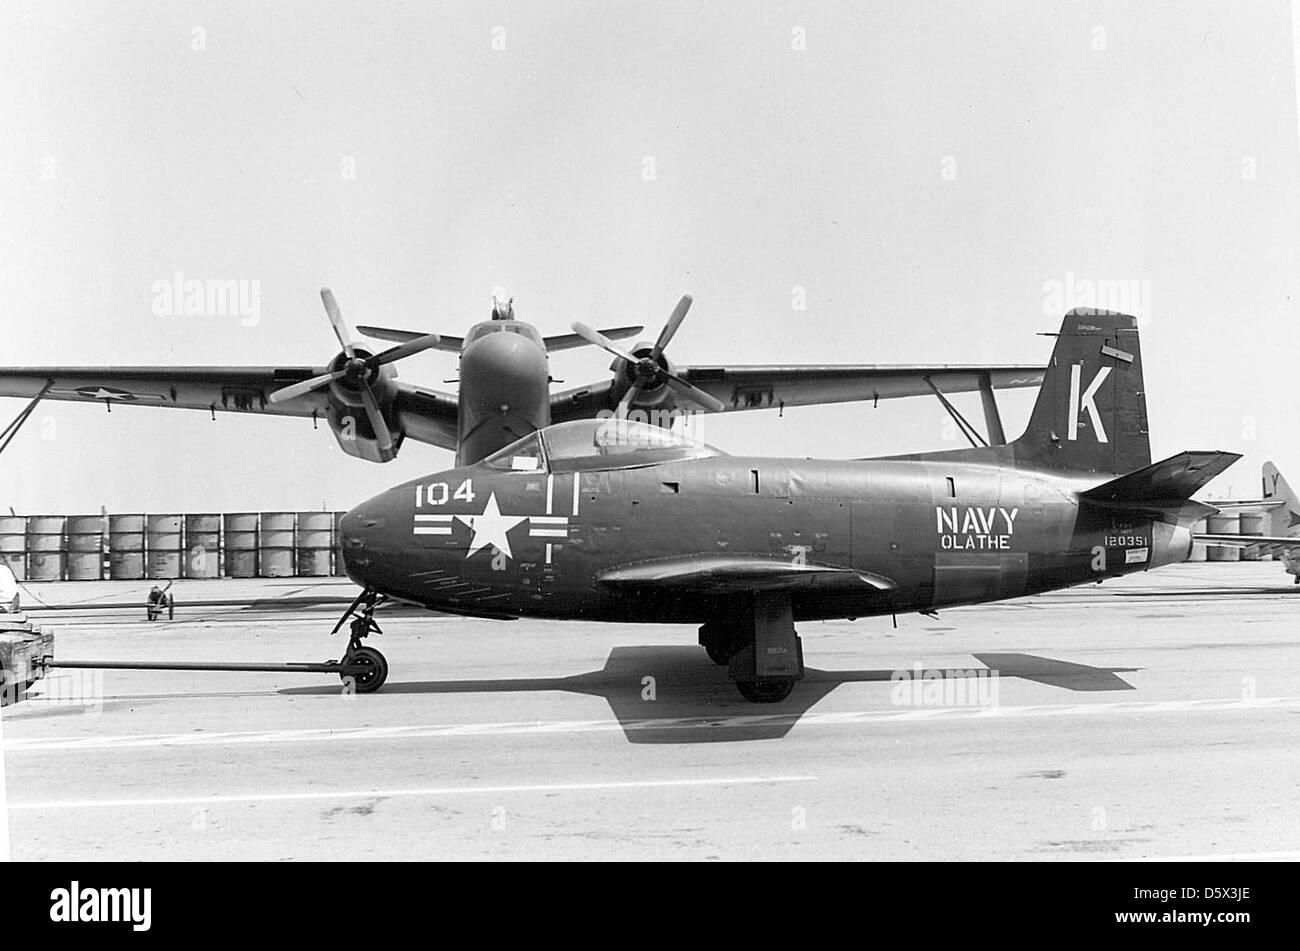 North American FJ-1 'Fury' of NARU Olathe, KS. - Stock Image